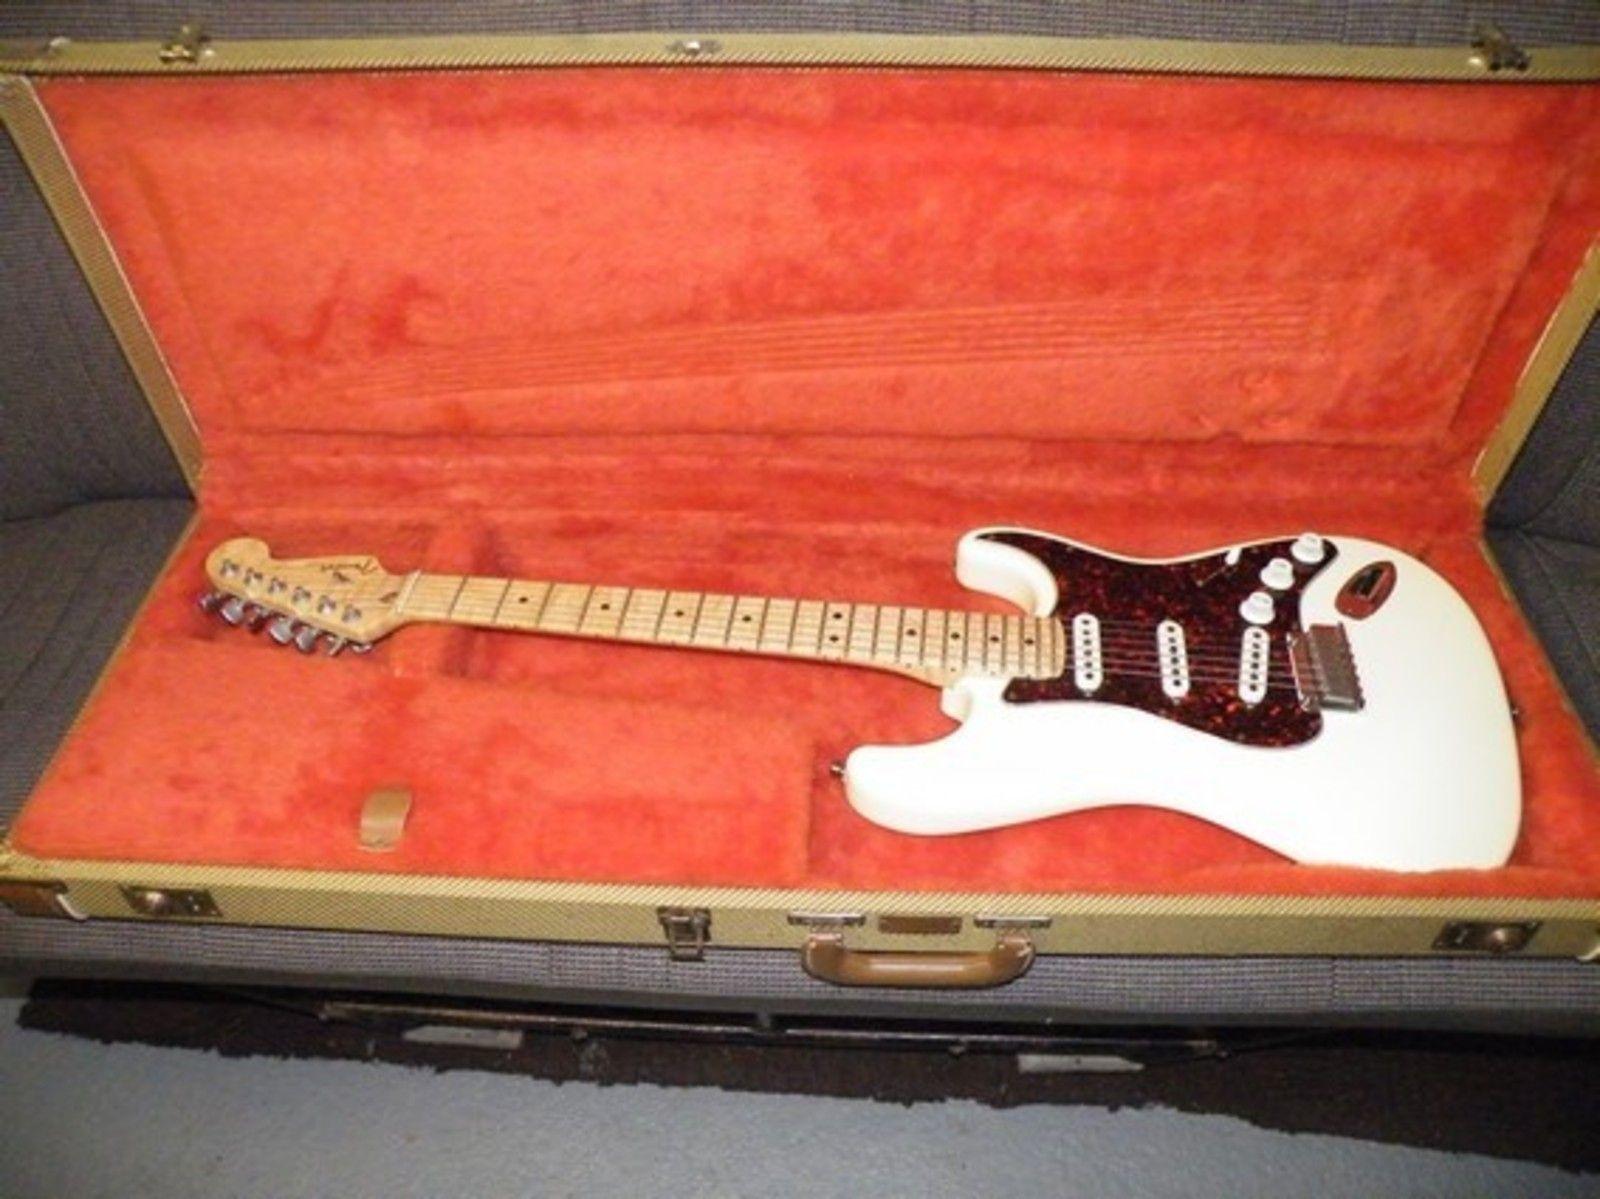 Fender custom shop american classic stratocaster image for American custom classics